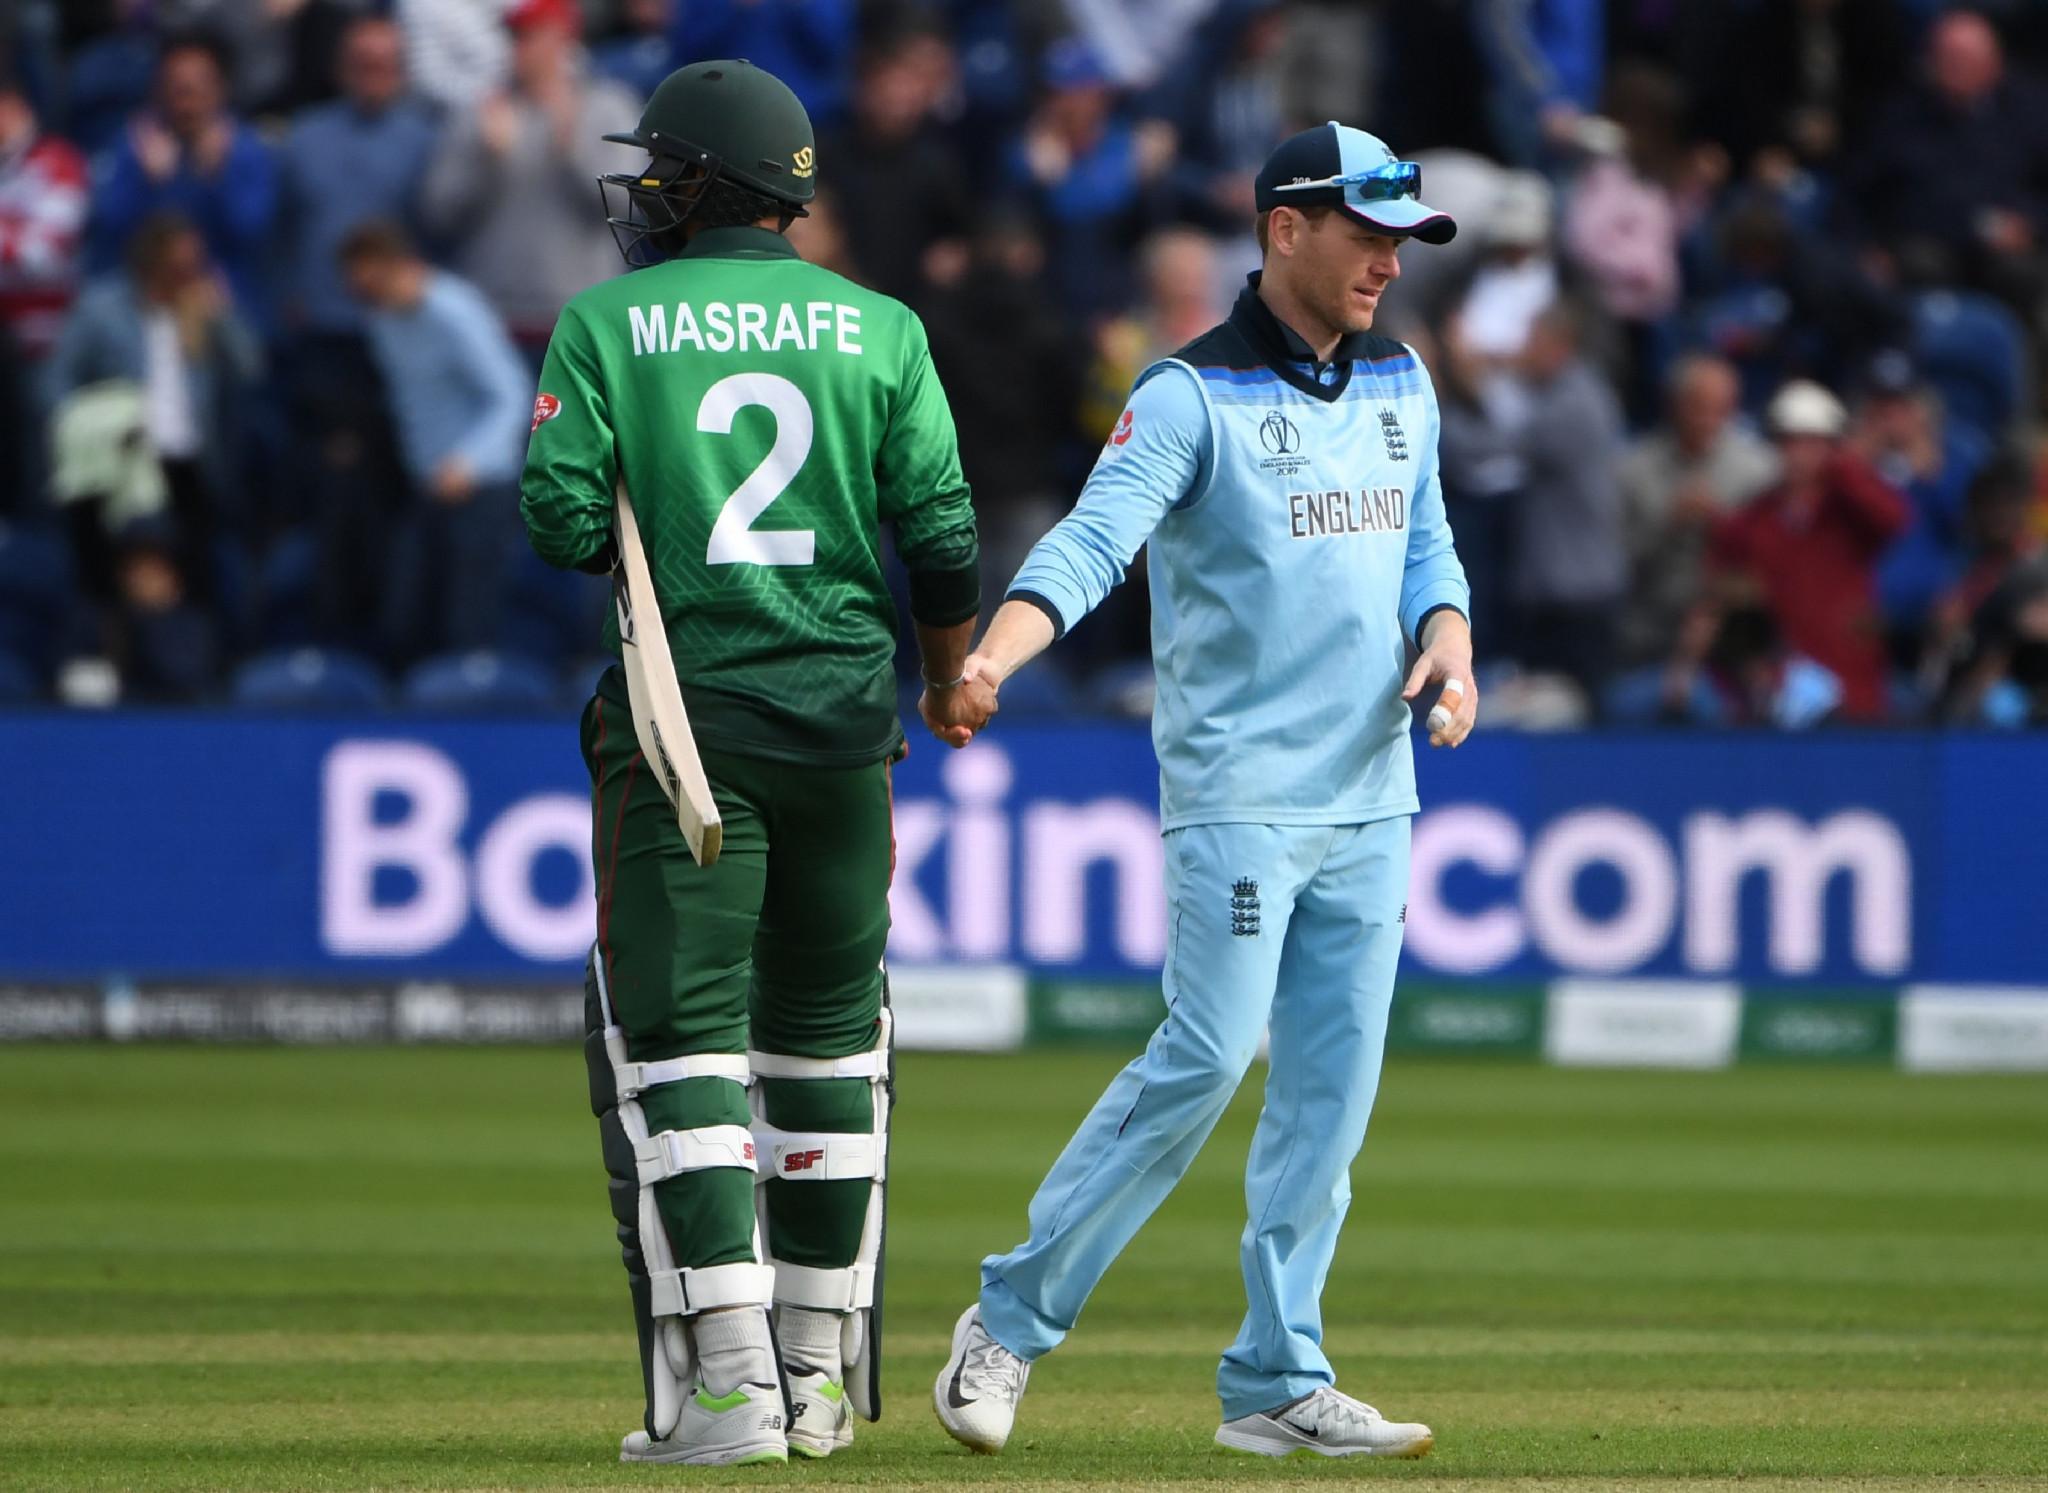 England cricket team's tour of Bangladesh postponed until March 2023